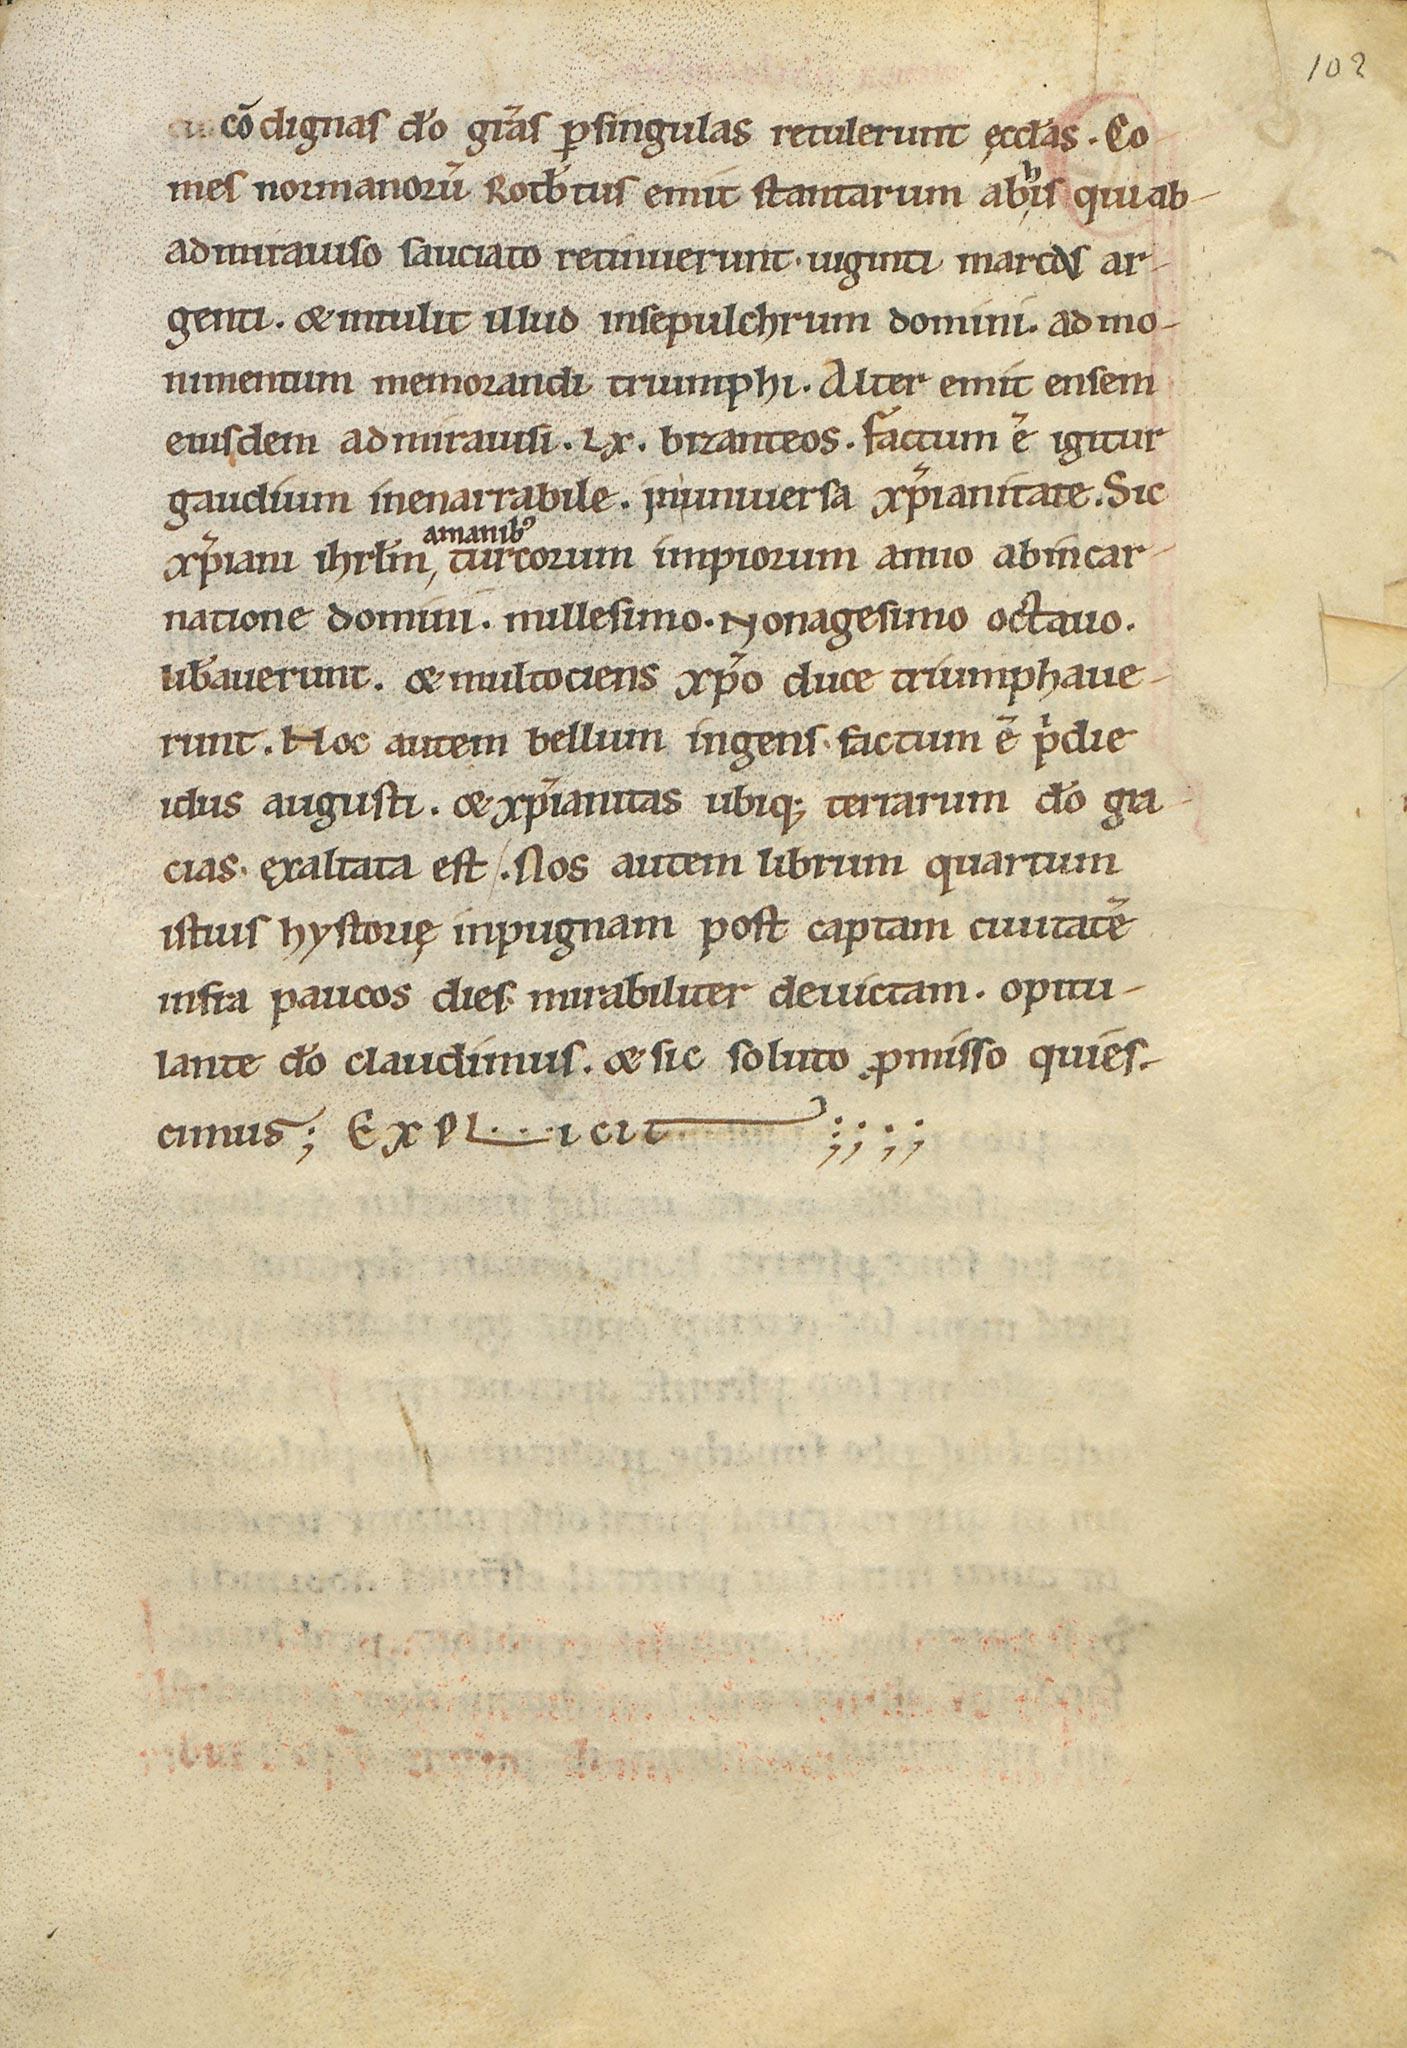 Manuscrit-Historia-Hierosolimitana-102r°